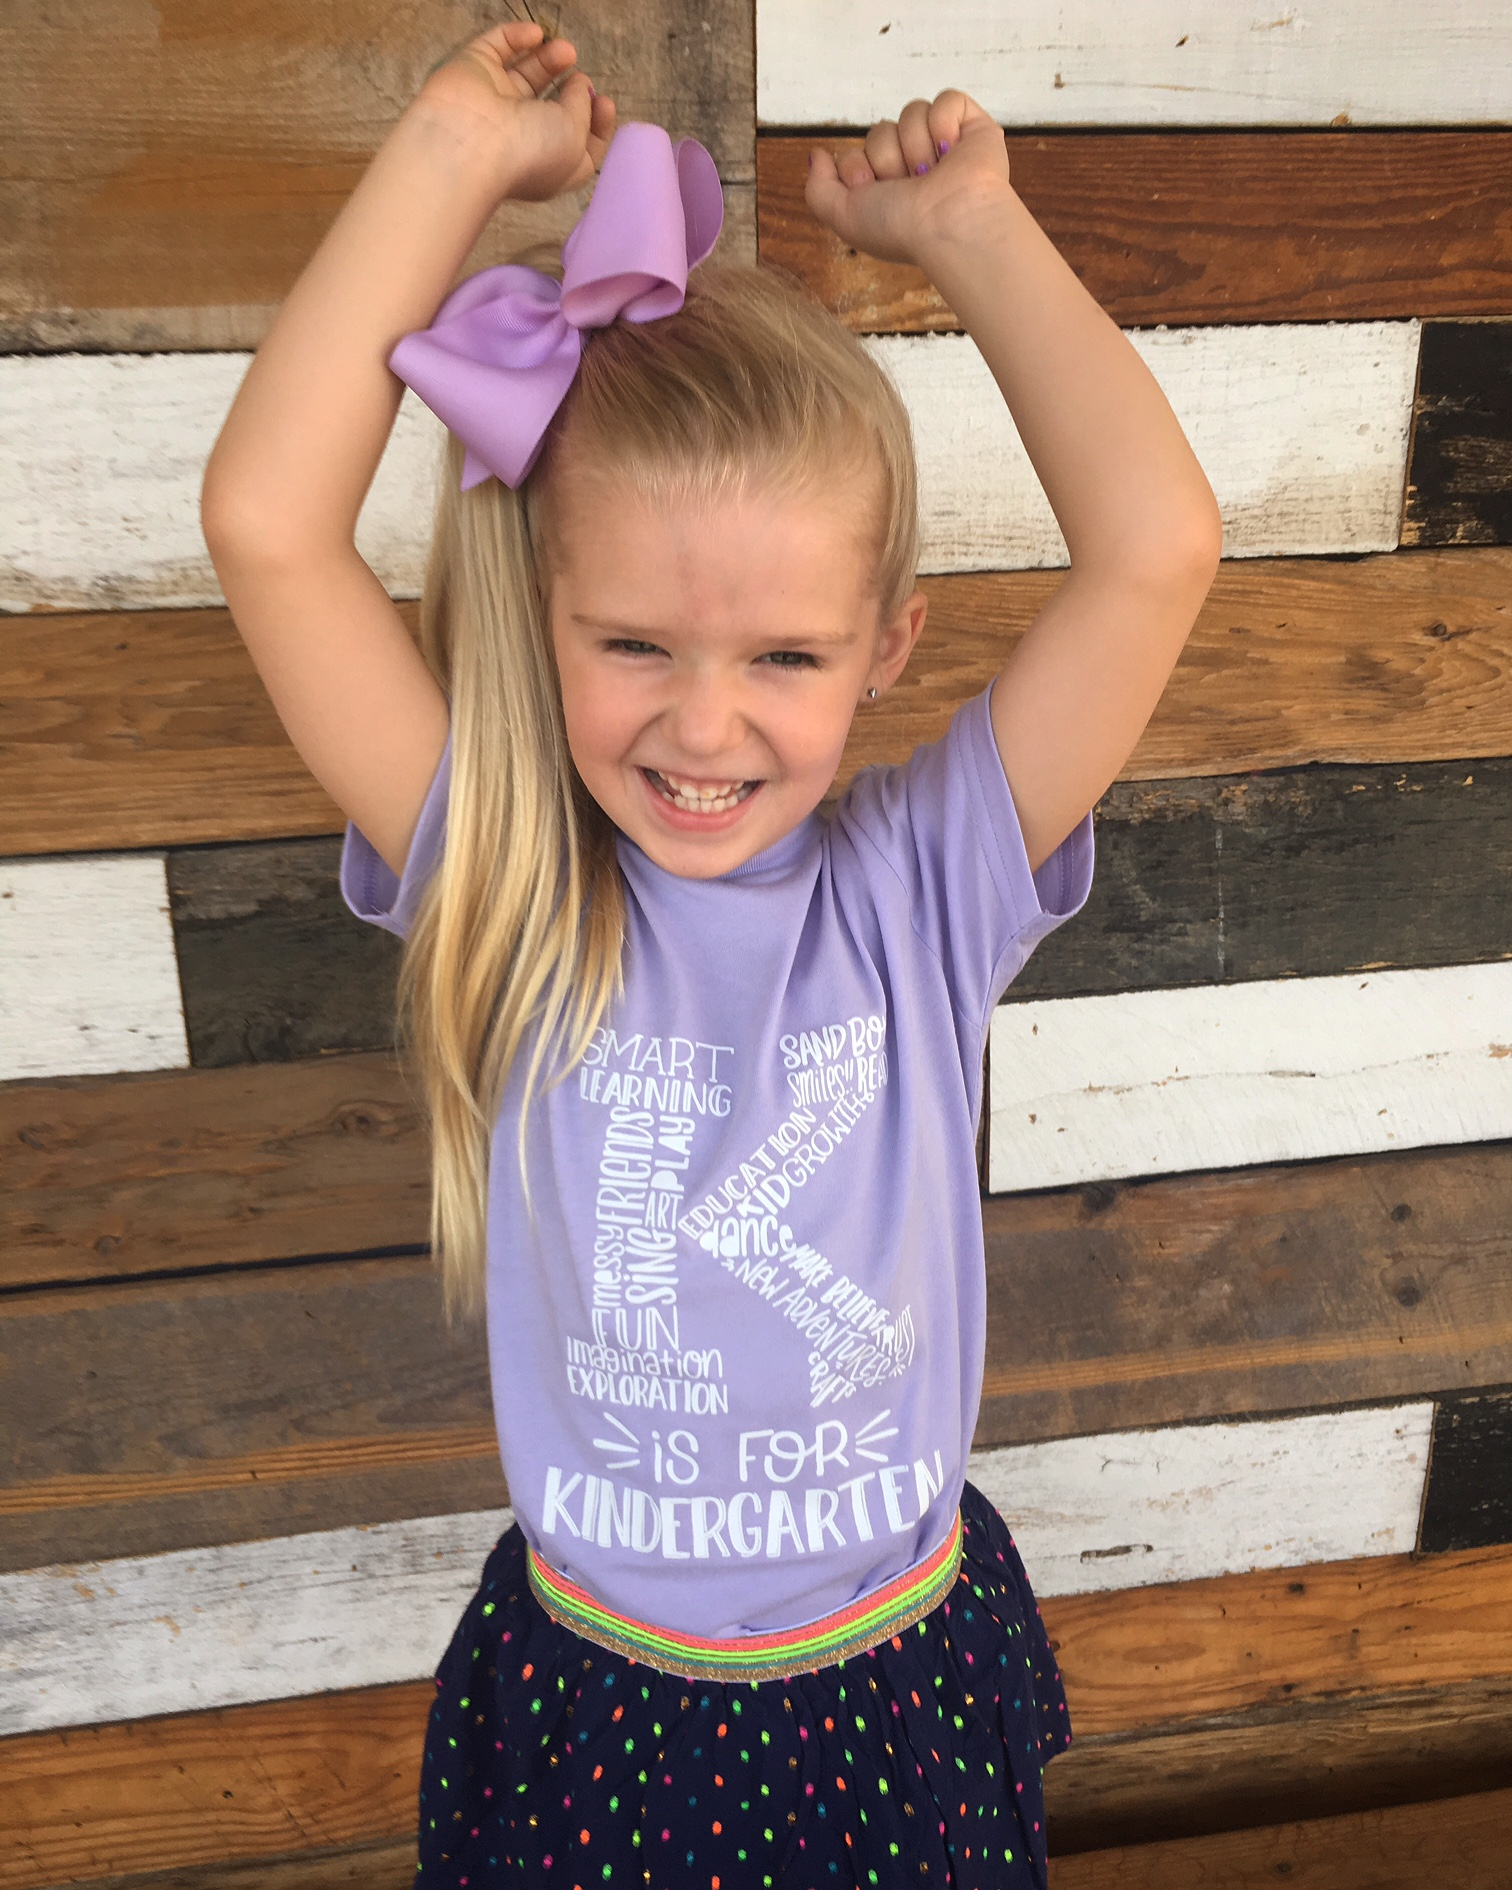 Gambarmemek Online Postimg Org Duo Sergei Naomi: Kindergarten Girlyoung Little Girl Getting A Spanking